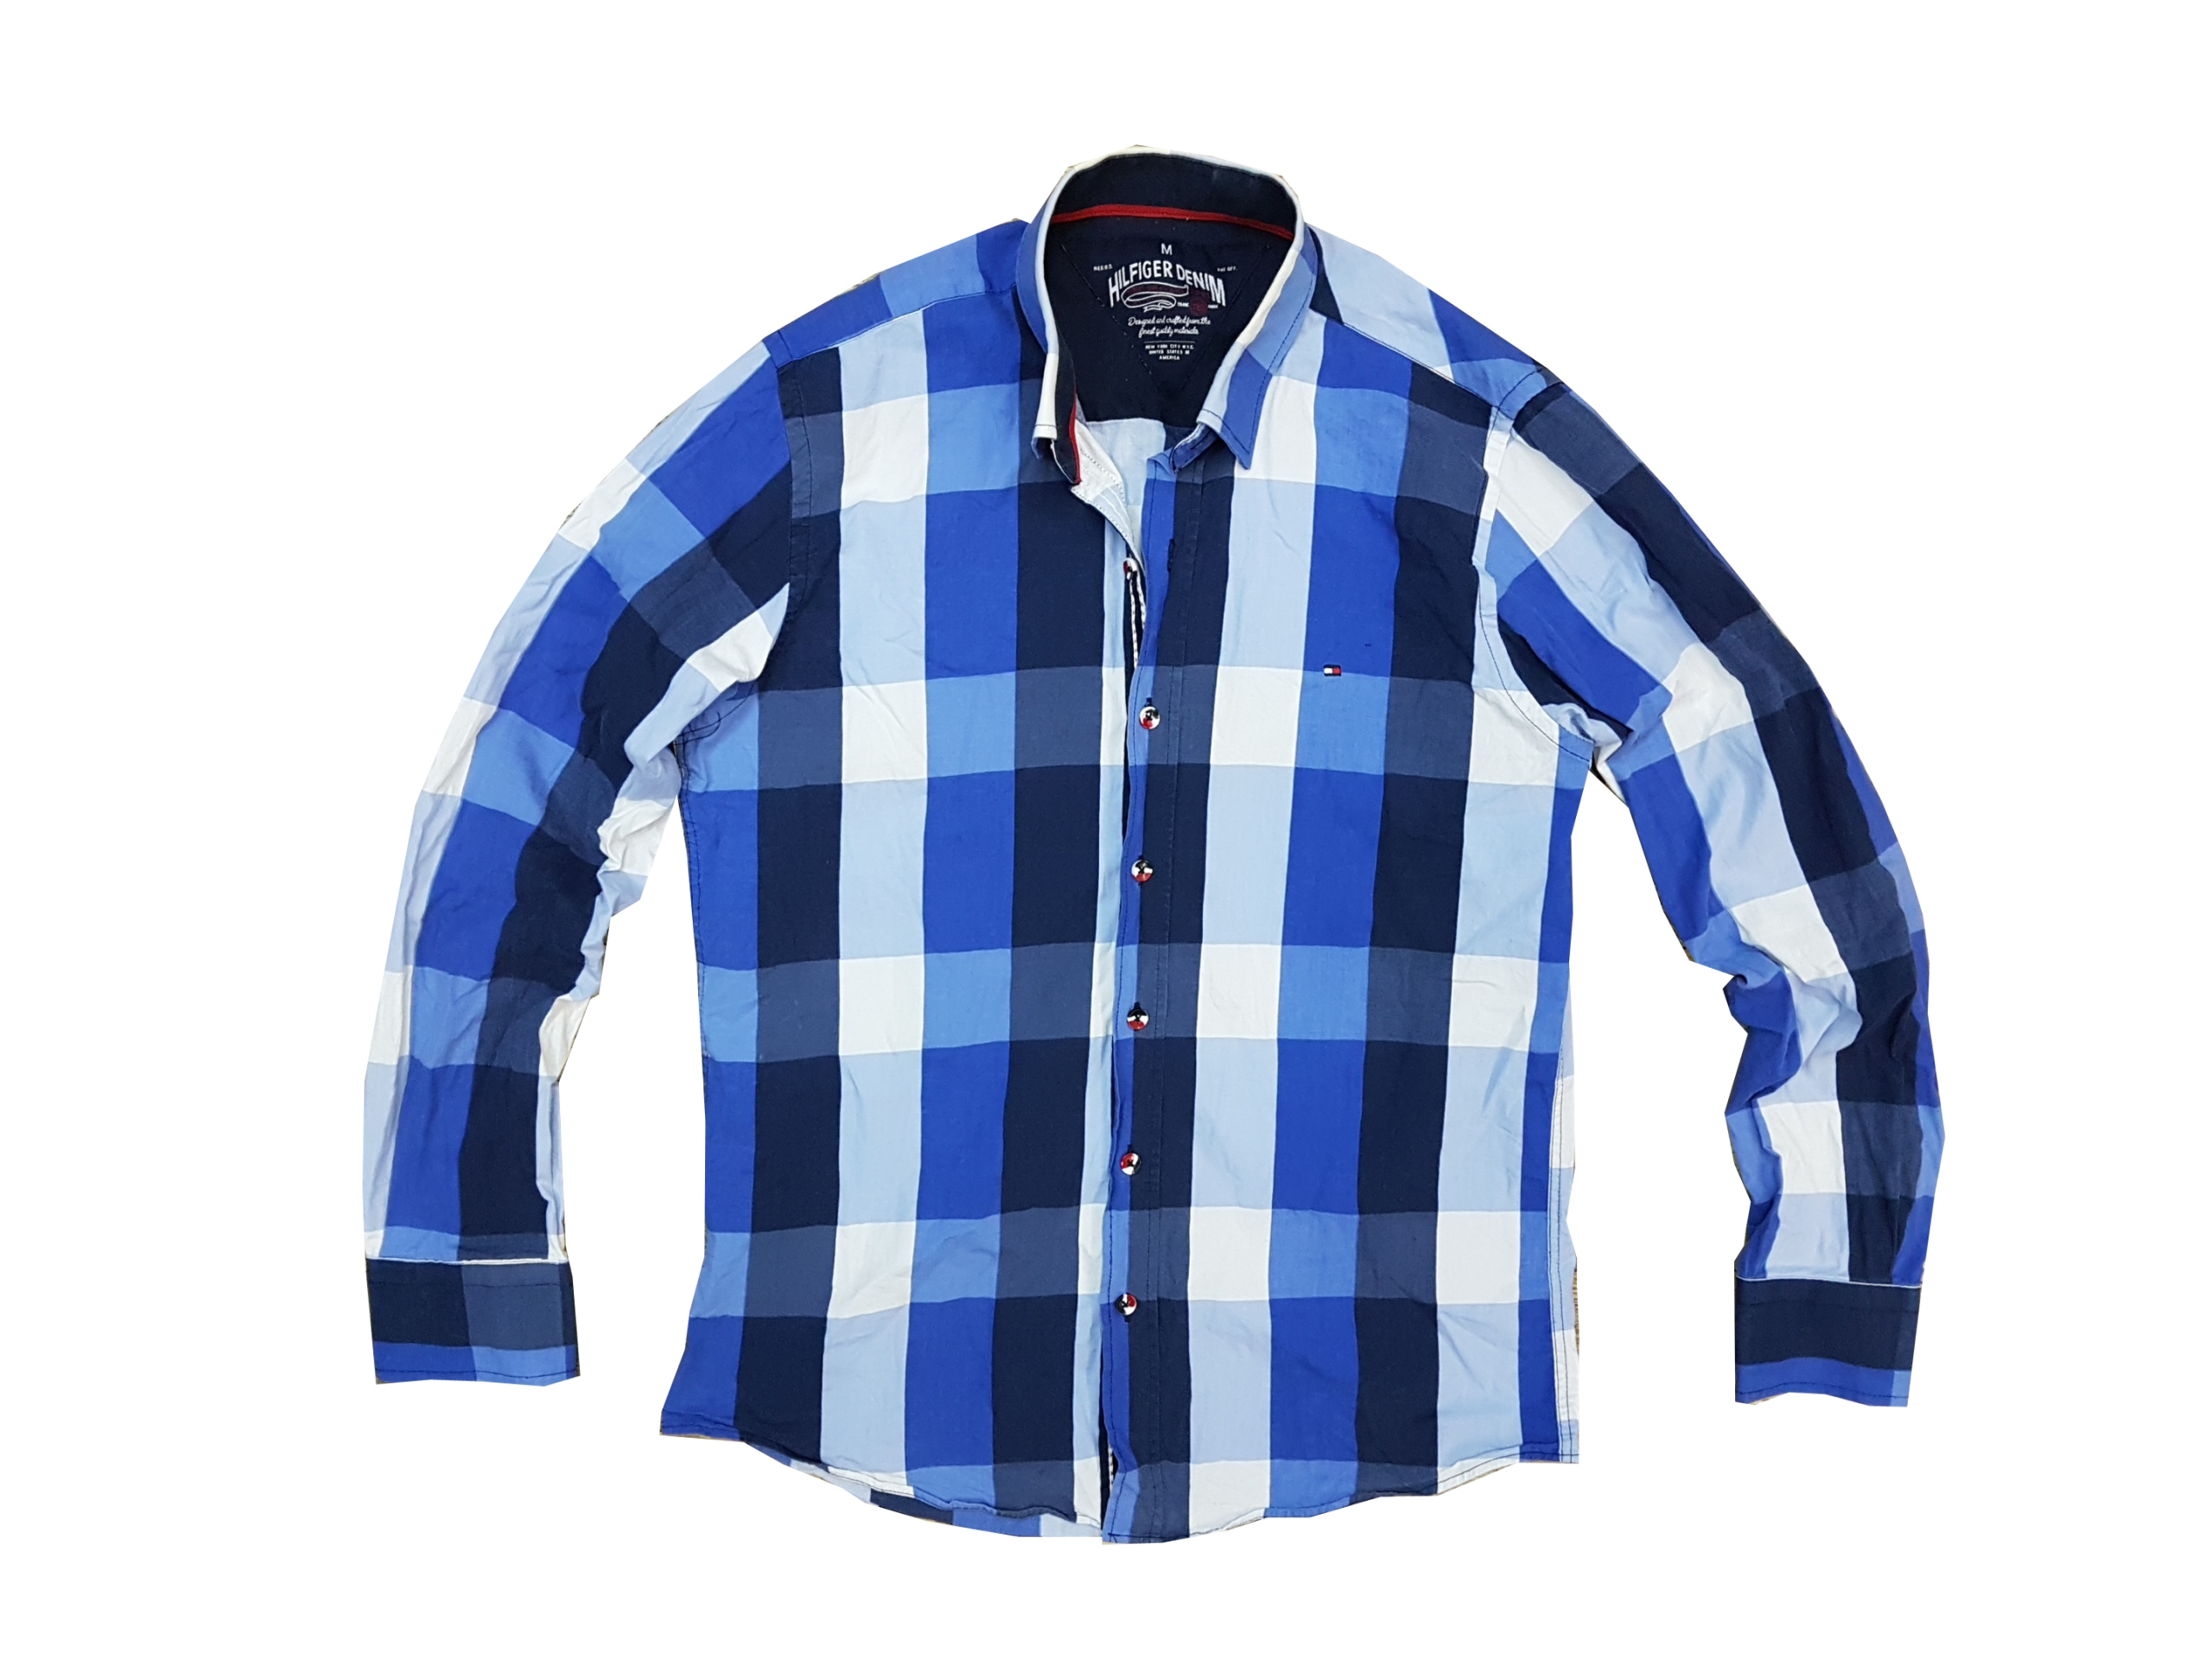 196f4def8 TOMMY HILFIGER koszula w kratę Slim Fit M - 7708072763 - oficjalne ...